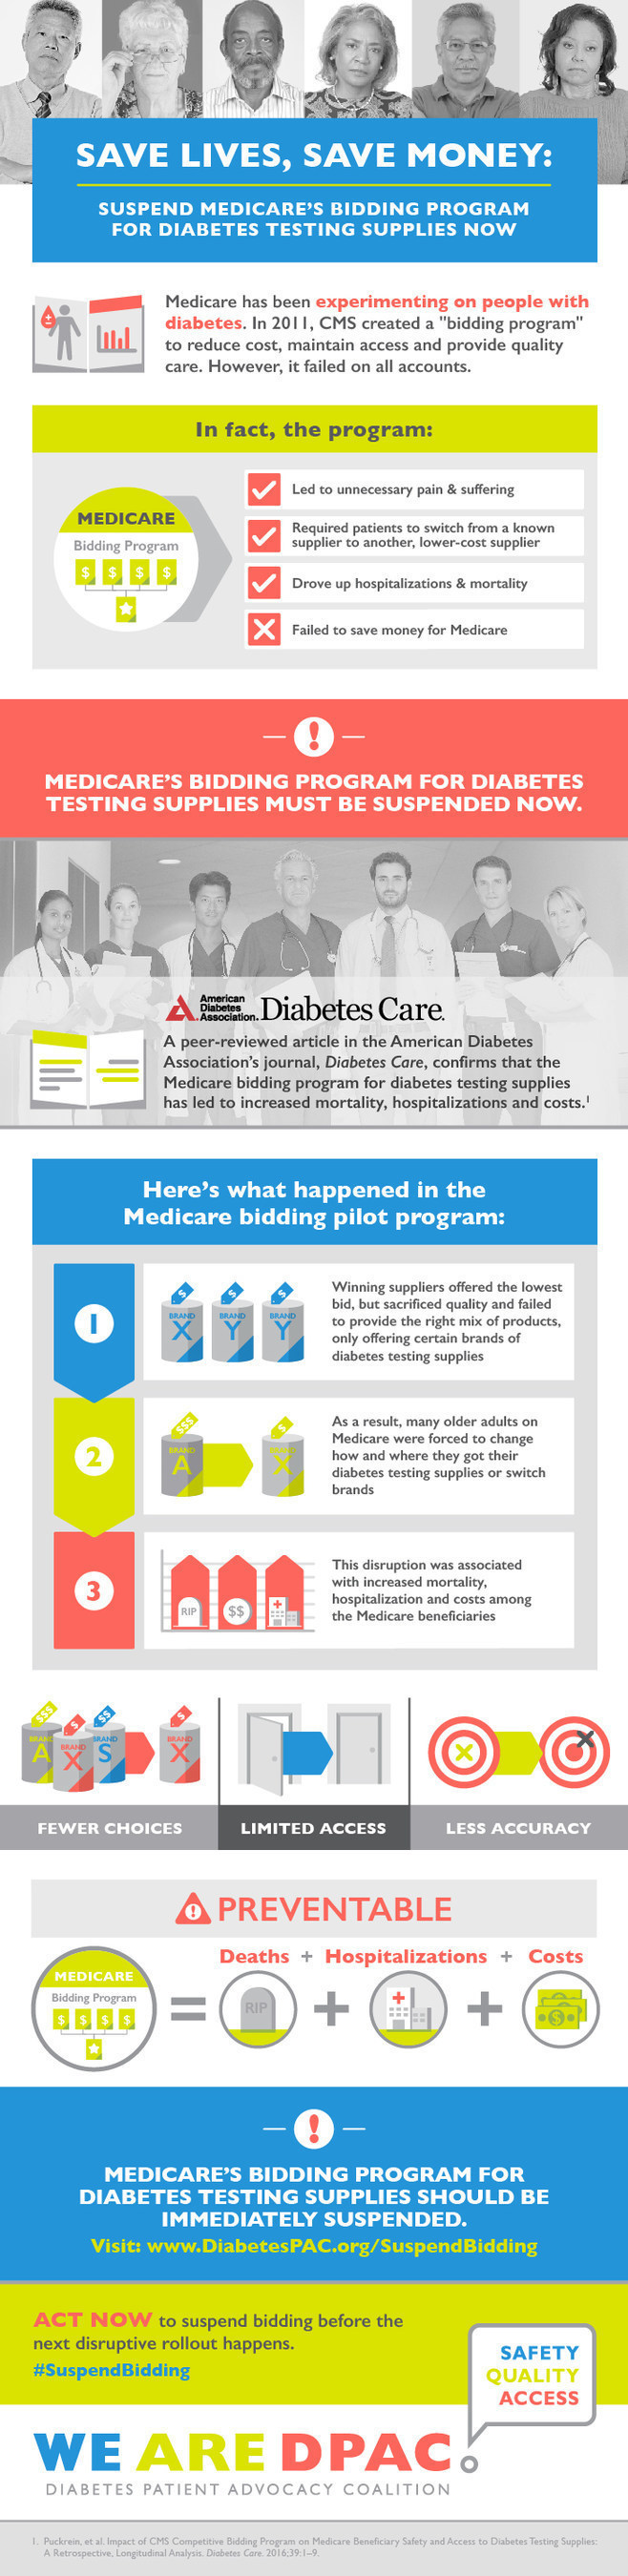 DPAC Infographic